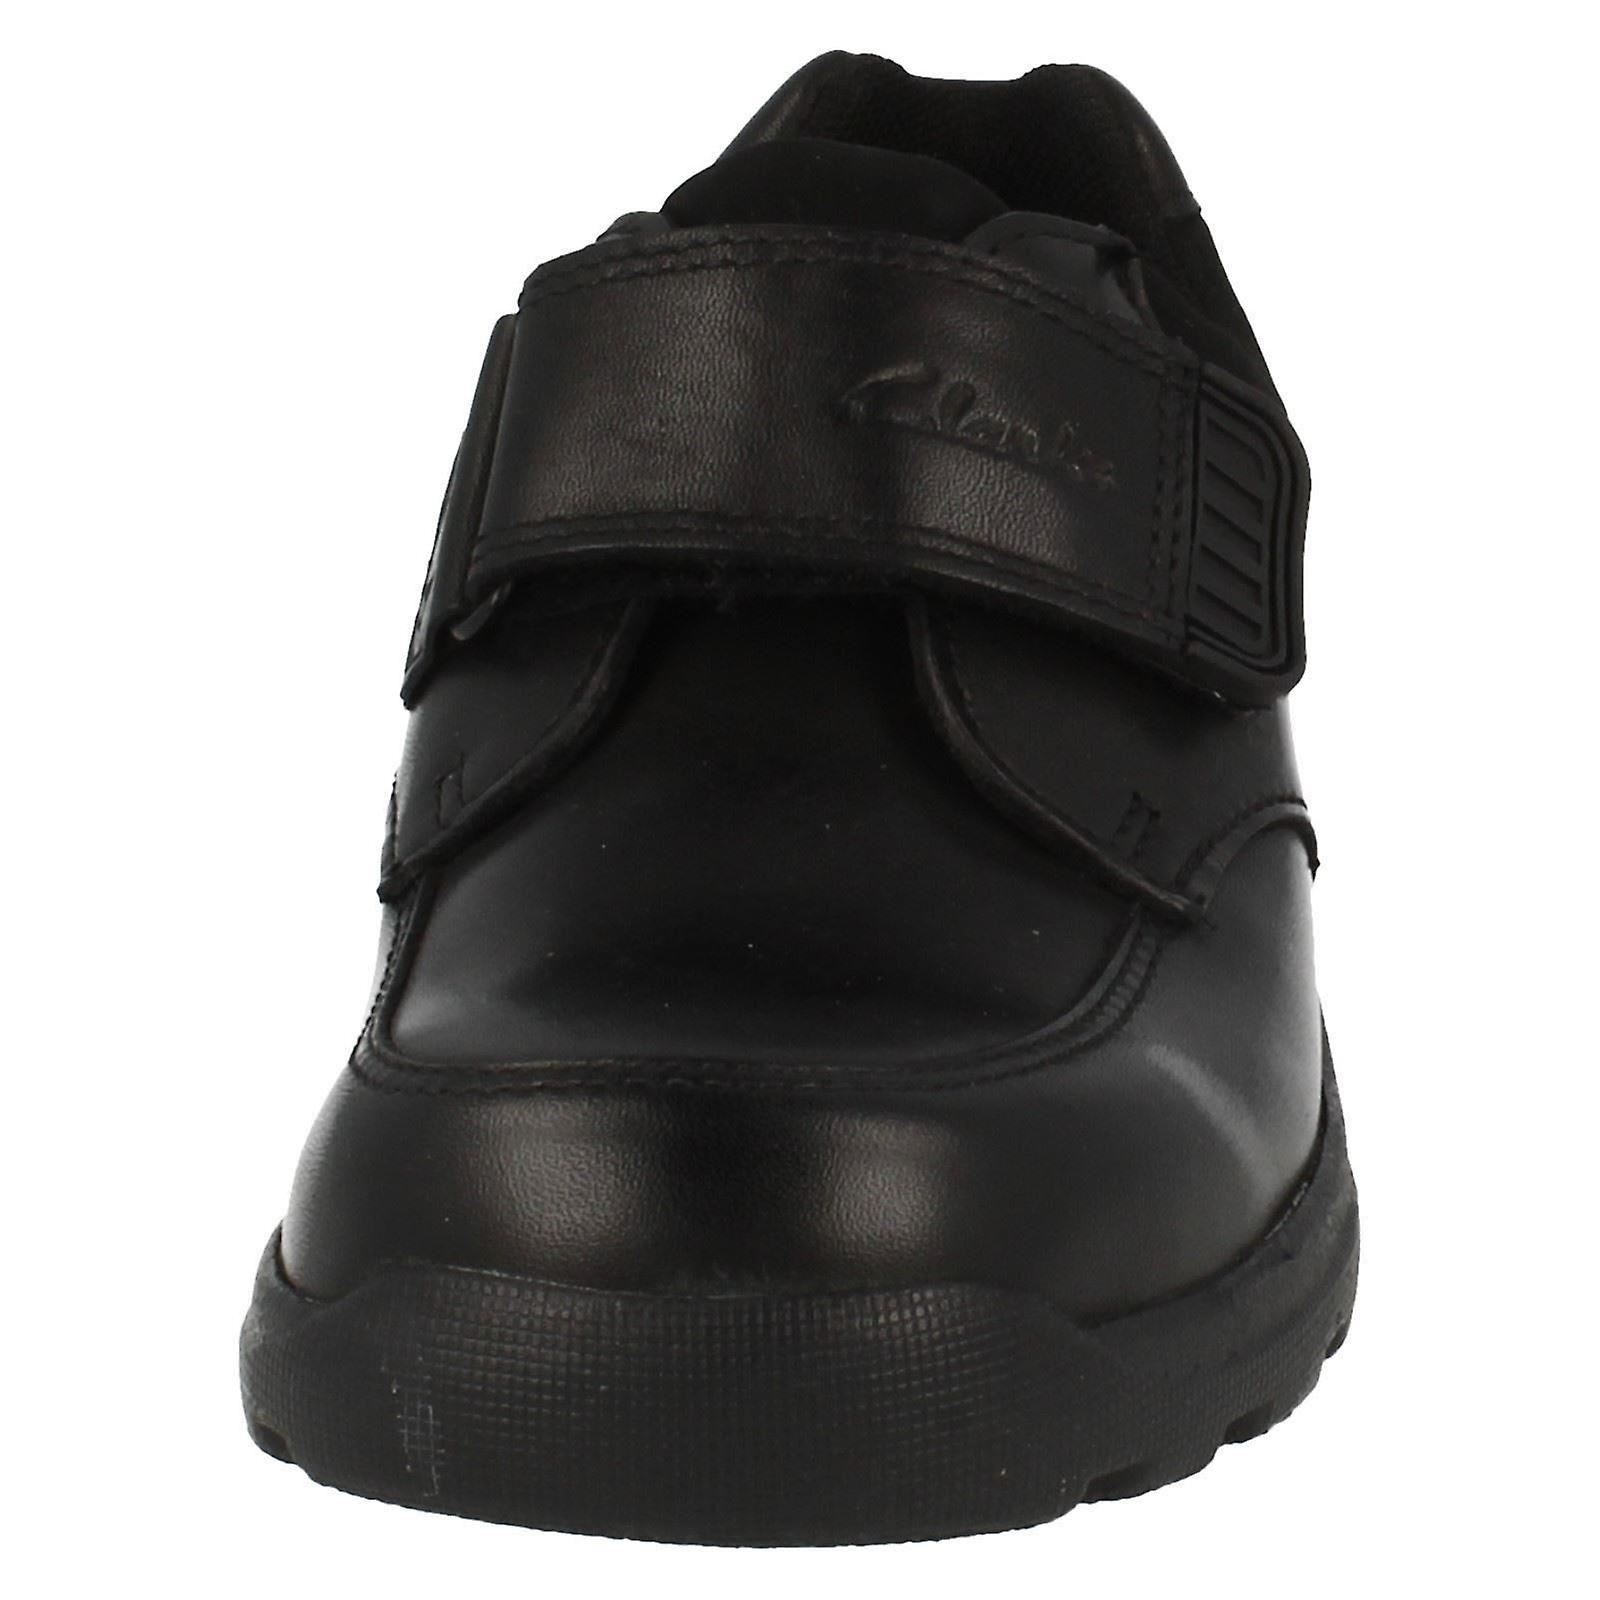 L'école De Garçons Clarks Gore-tex Chaussures Tam Go Gtx